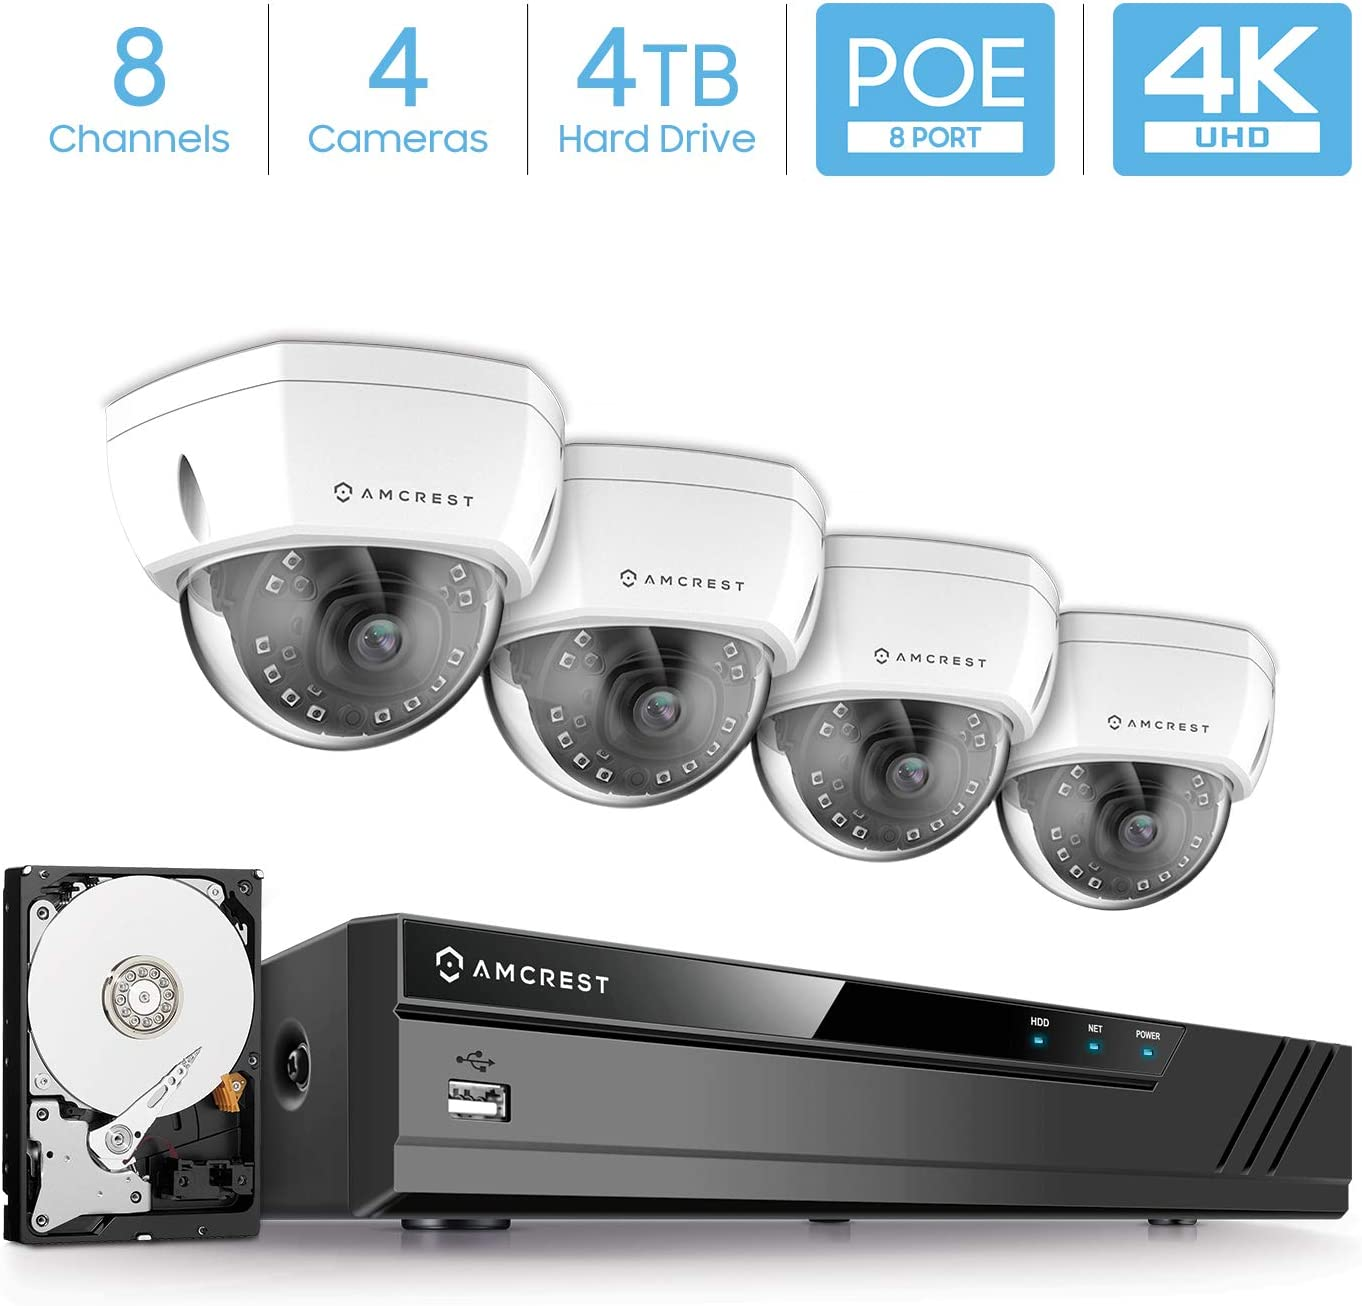 Amcrest 4K 8CH Security Camera System w 4K 8MP NVR, 4 x 4K 8-Megapixel IP67 Weatherproof Metal Dome POE IP Cameras 3840×2160 ,Pre-Installed 4TB Hard Drive, NV4108E-HS-IP8M-2493EW4-4TB White